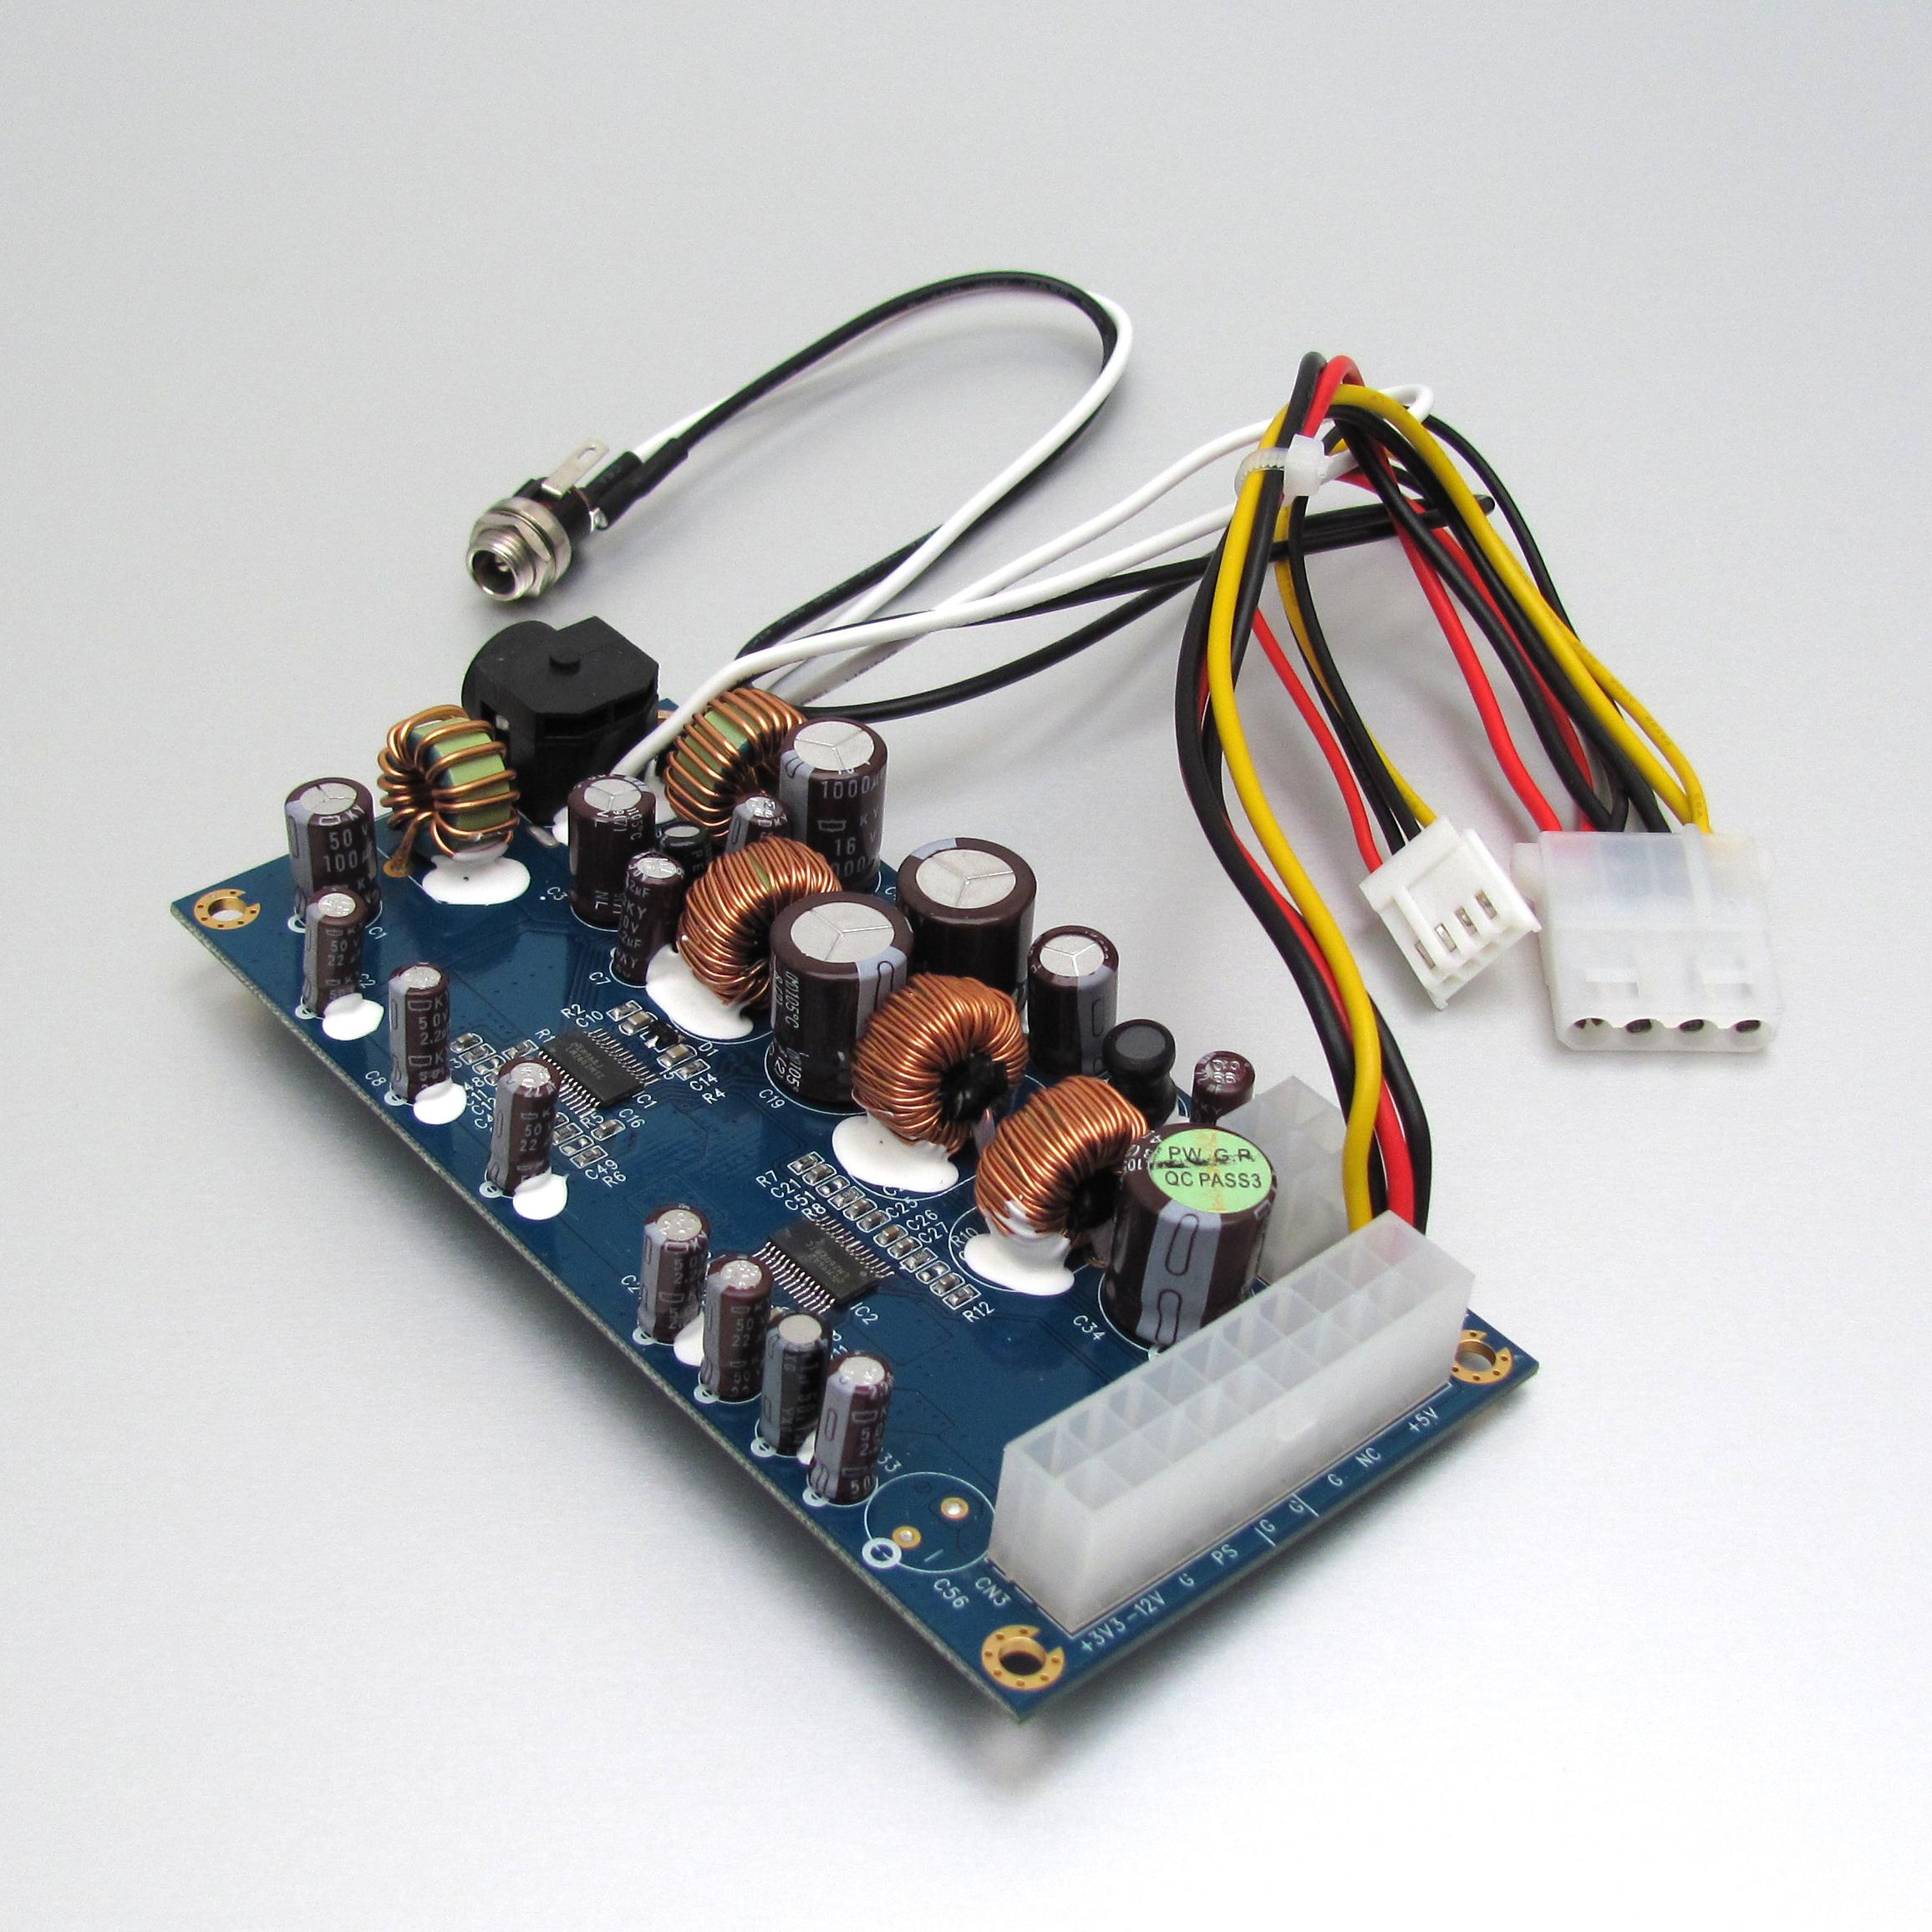 zdroj EM-120FLS-DD vstup 18-28VDC 120W